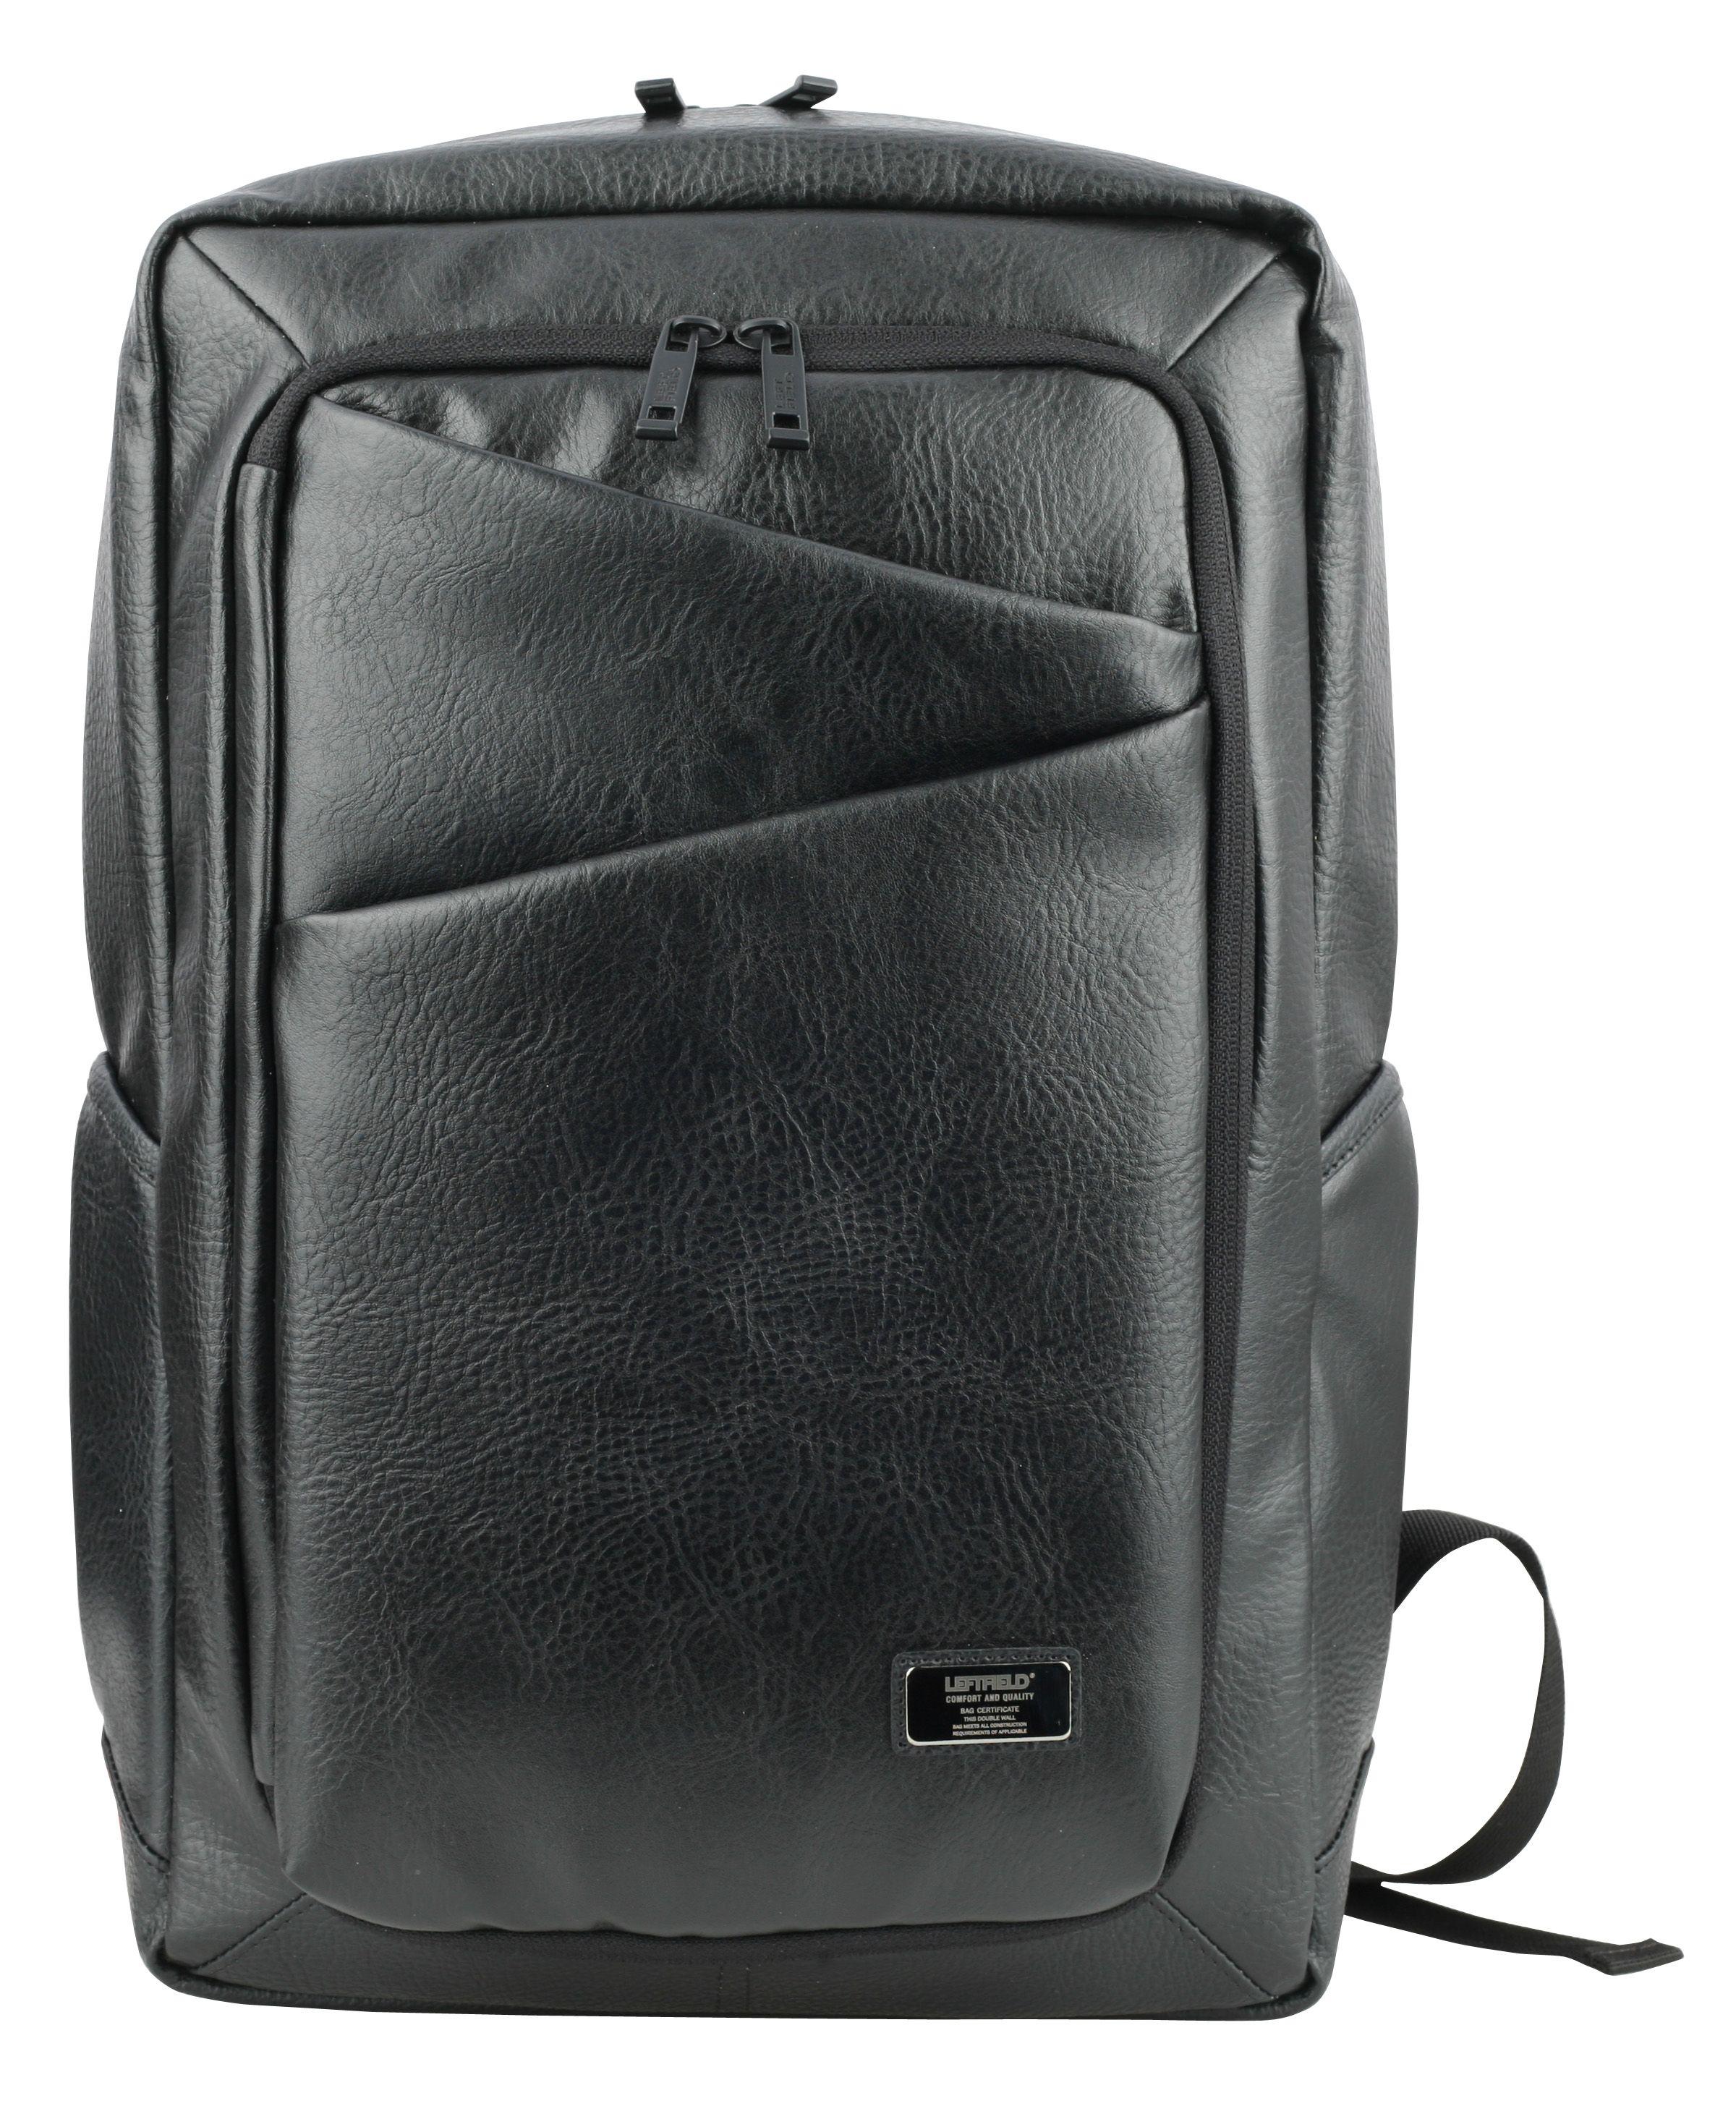 507d800354 Korean fashion backpacks for men. Vintage style faux leather daypacks for  school